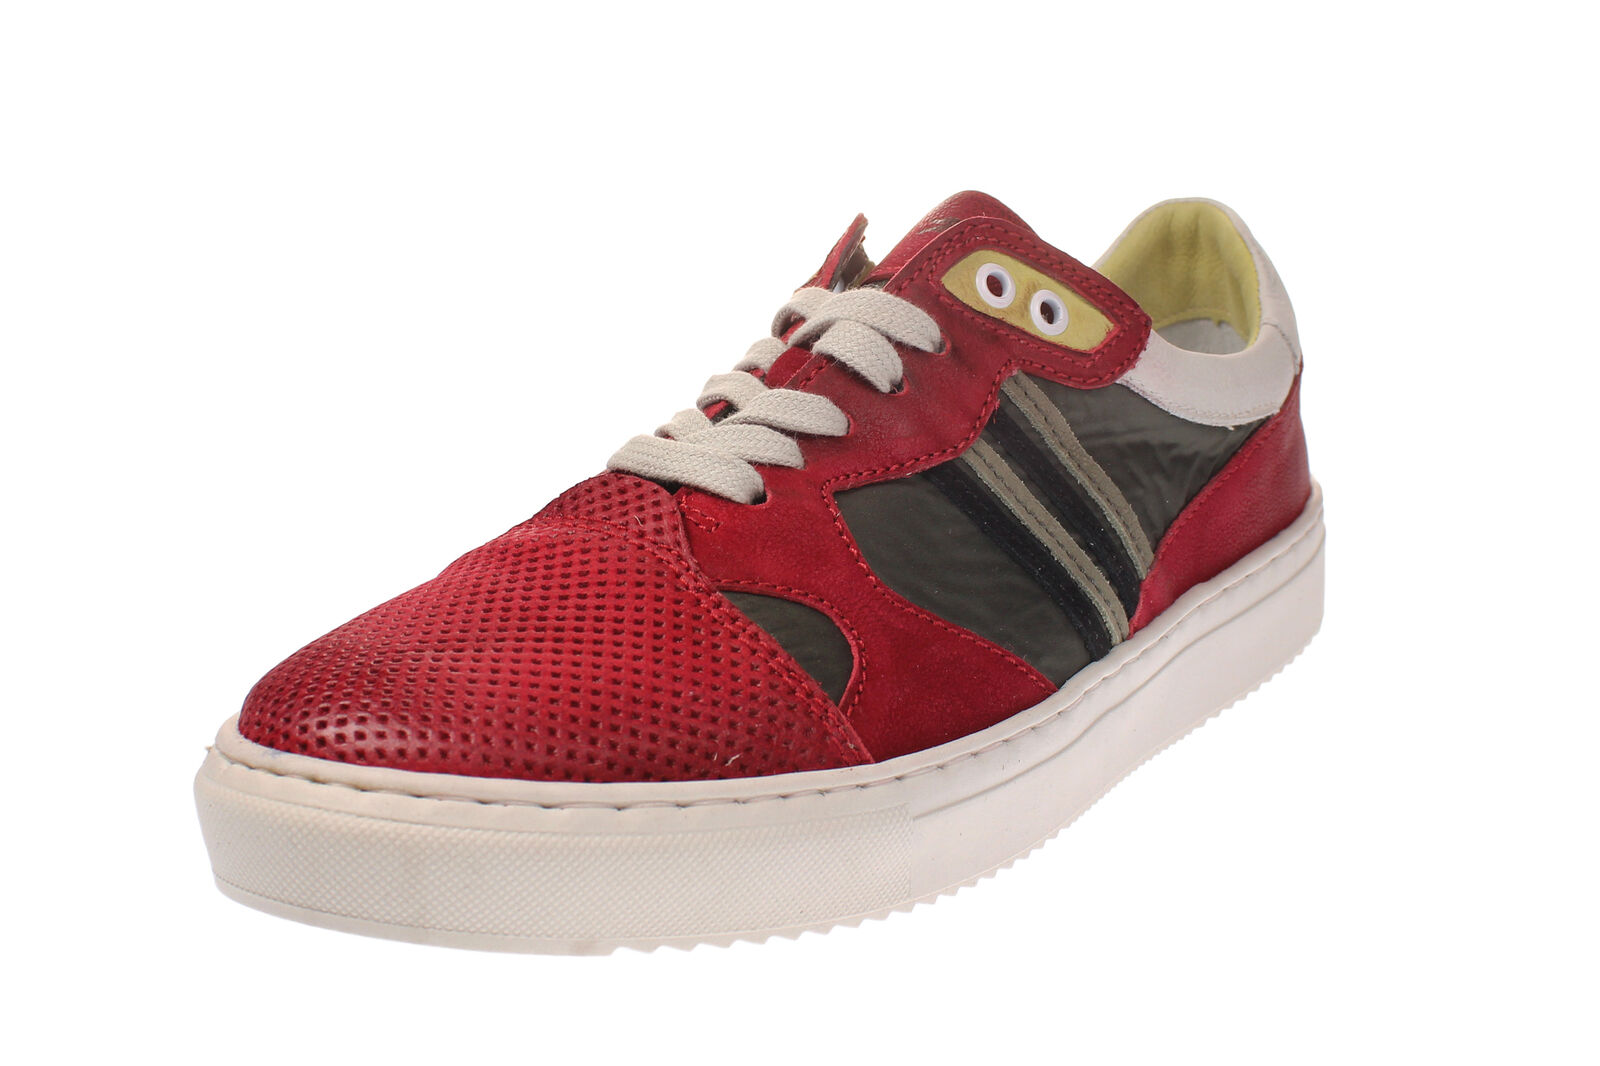 Mjus 379101-101-0001 - caballero zapatos zapatillas-combi - 1-Porpora